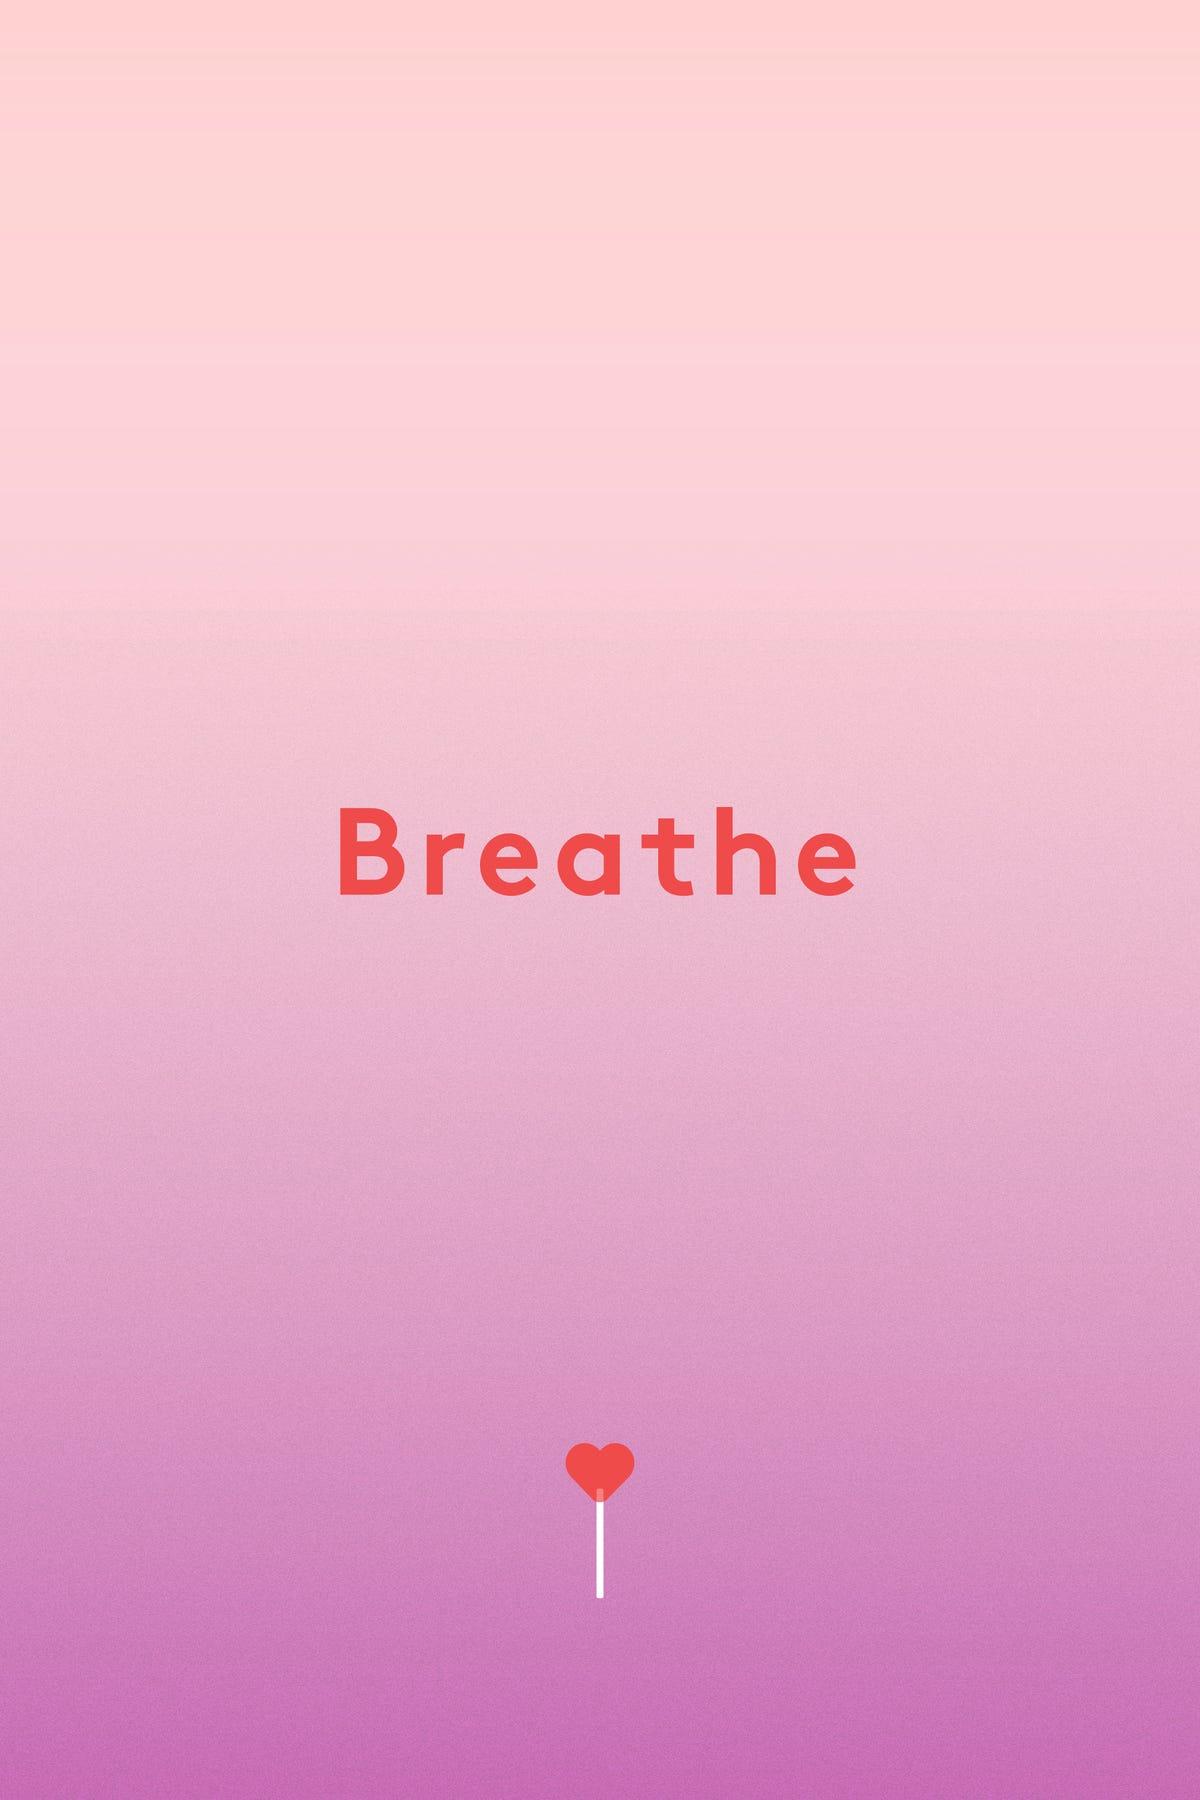 How To Get Over A Breakup: Heal Broken Heart & Move On